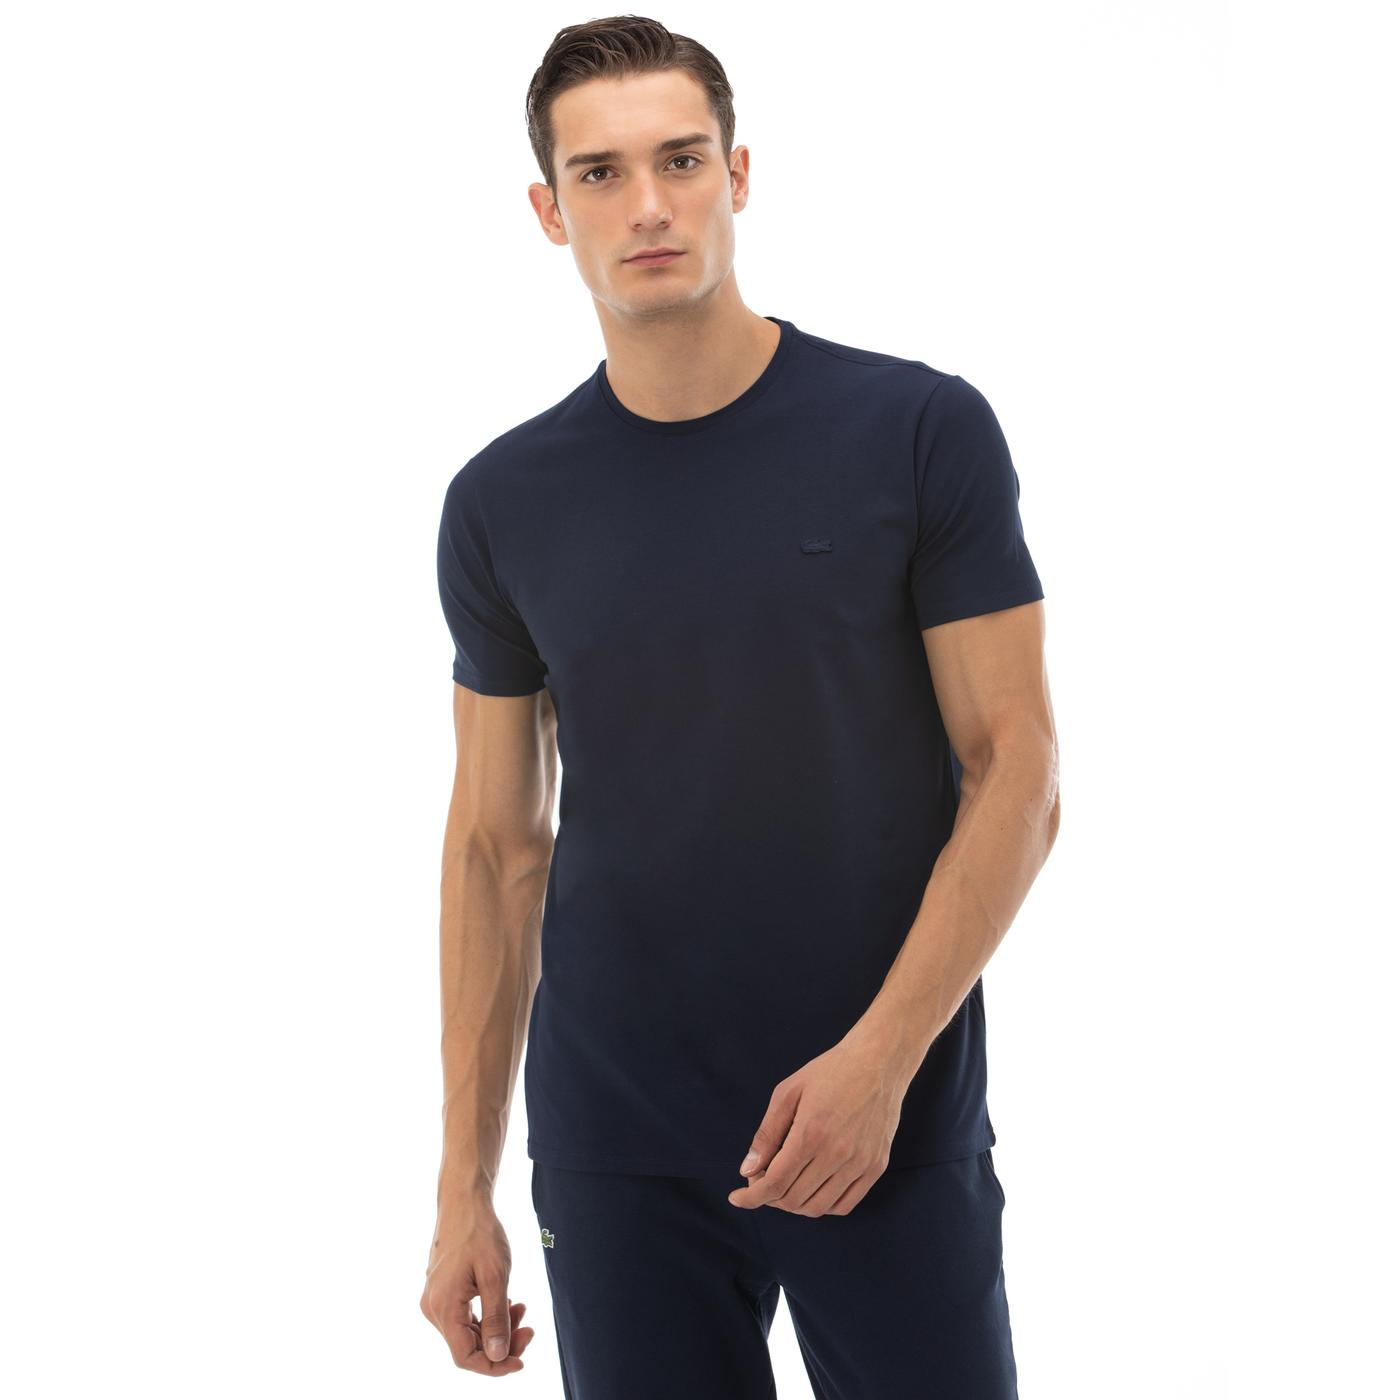 Lacoste Erkek Regular Fit Bisiklet Yaka Lacivert T-Shirt